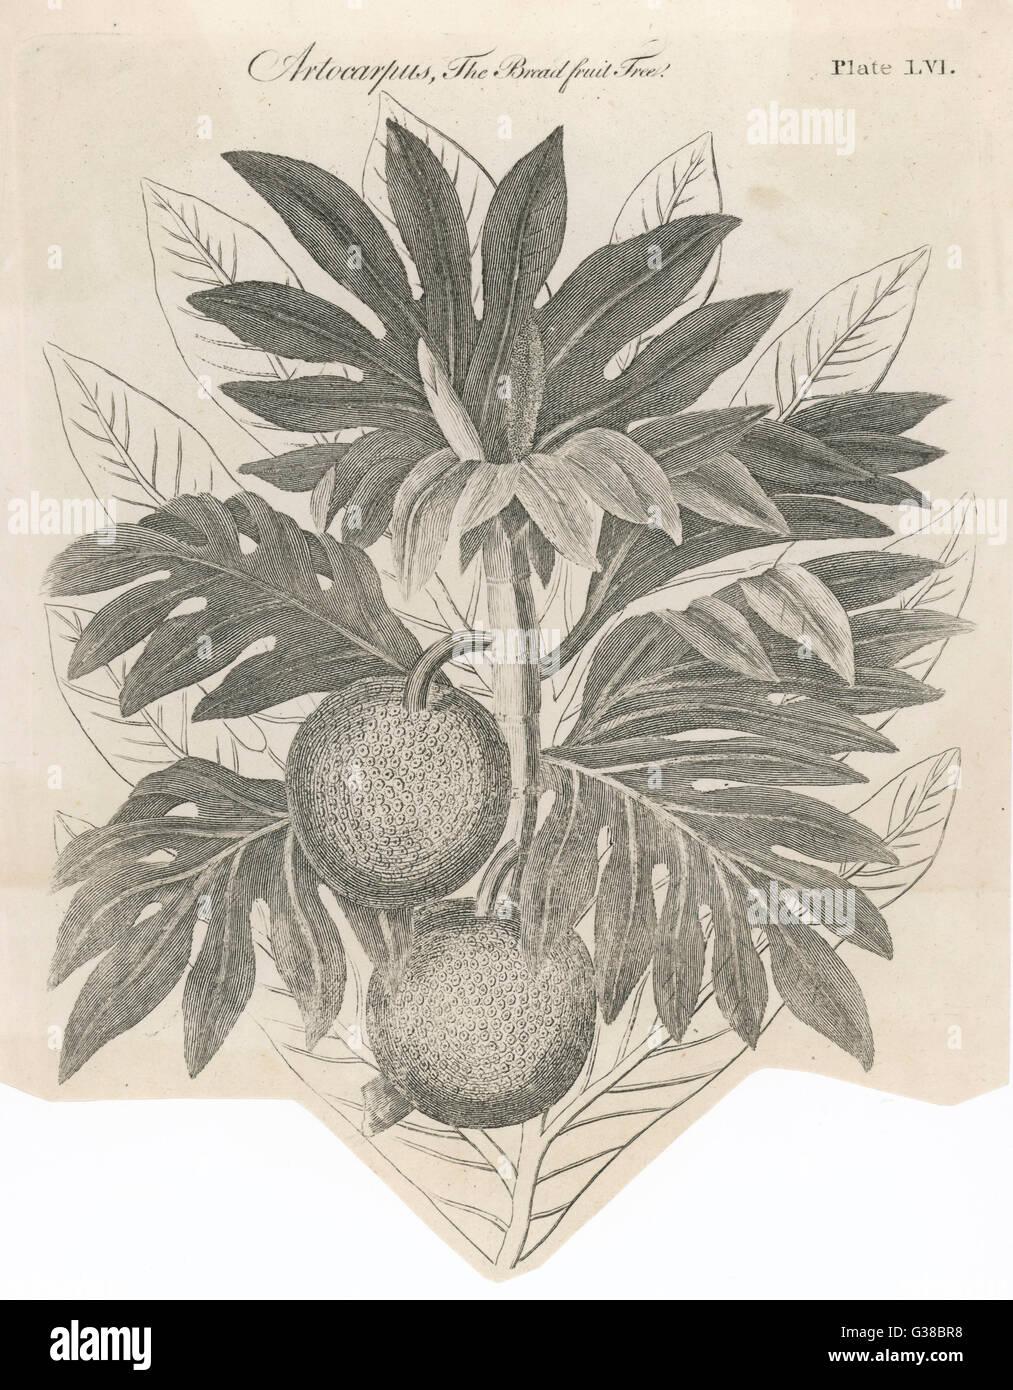 BREAD FRUIT         Date: 1768 - Stock Image